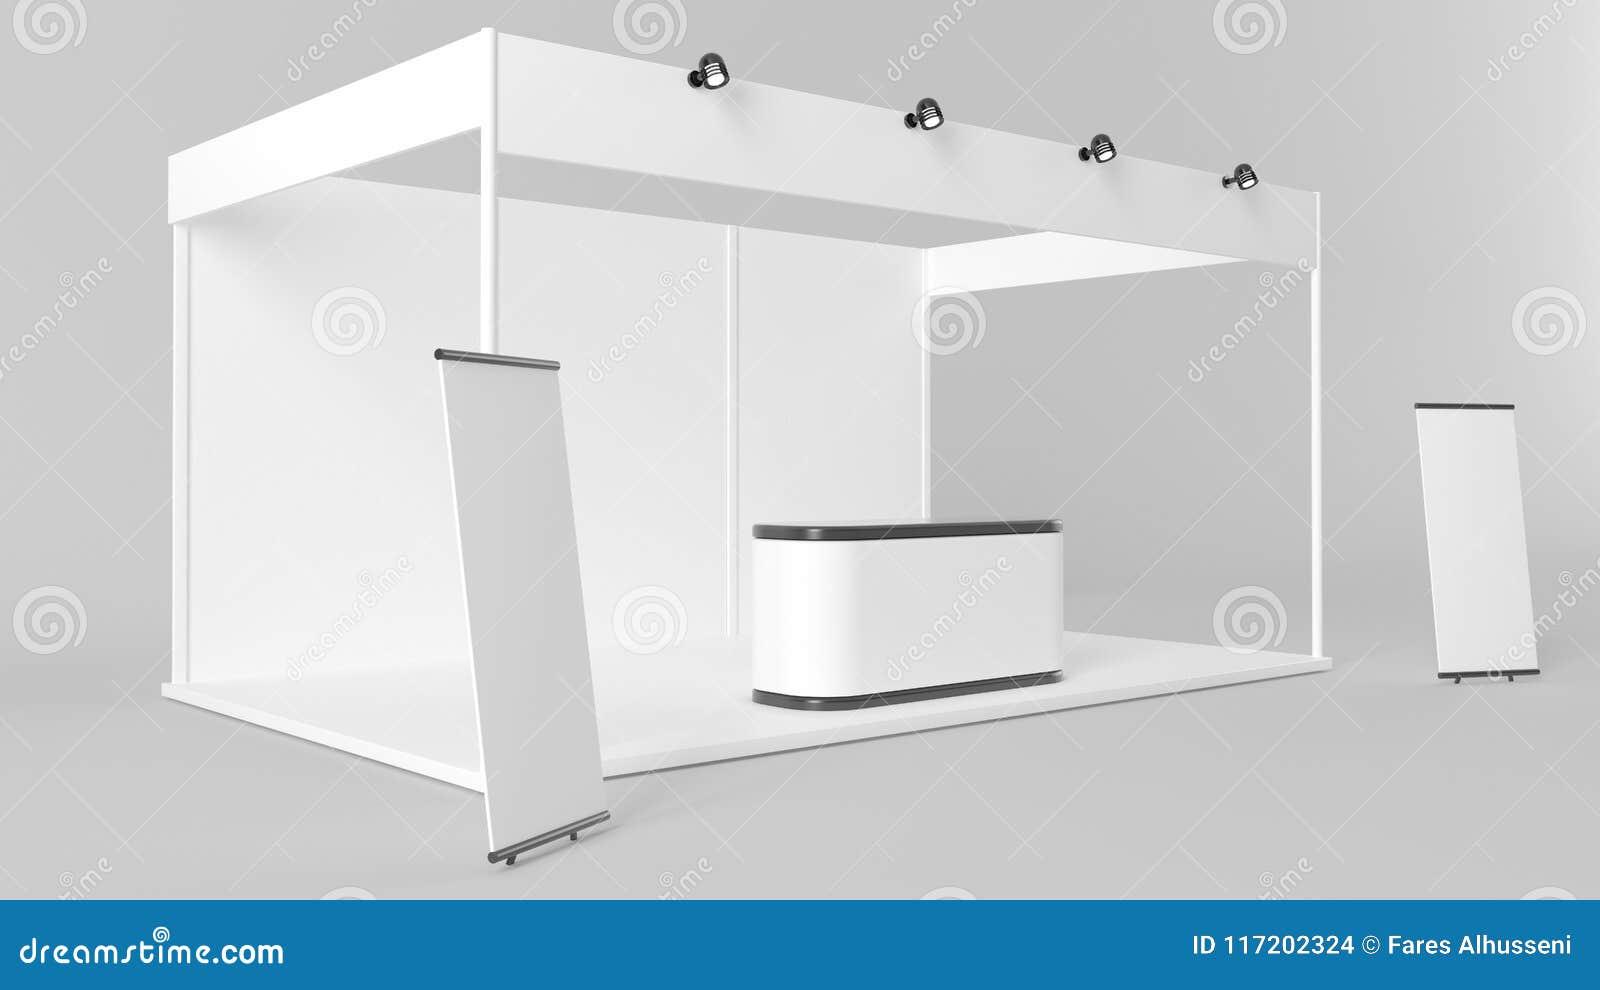 Exhibition Stand Template : White creative exhibition stand design booth template corporate